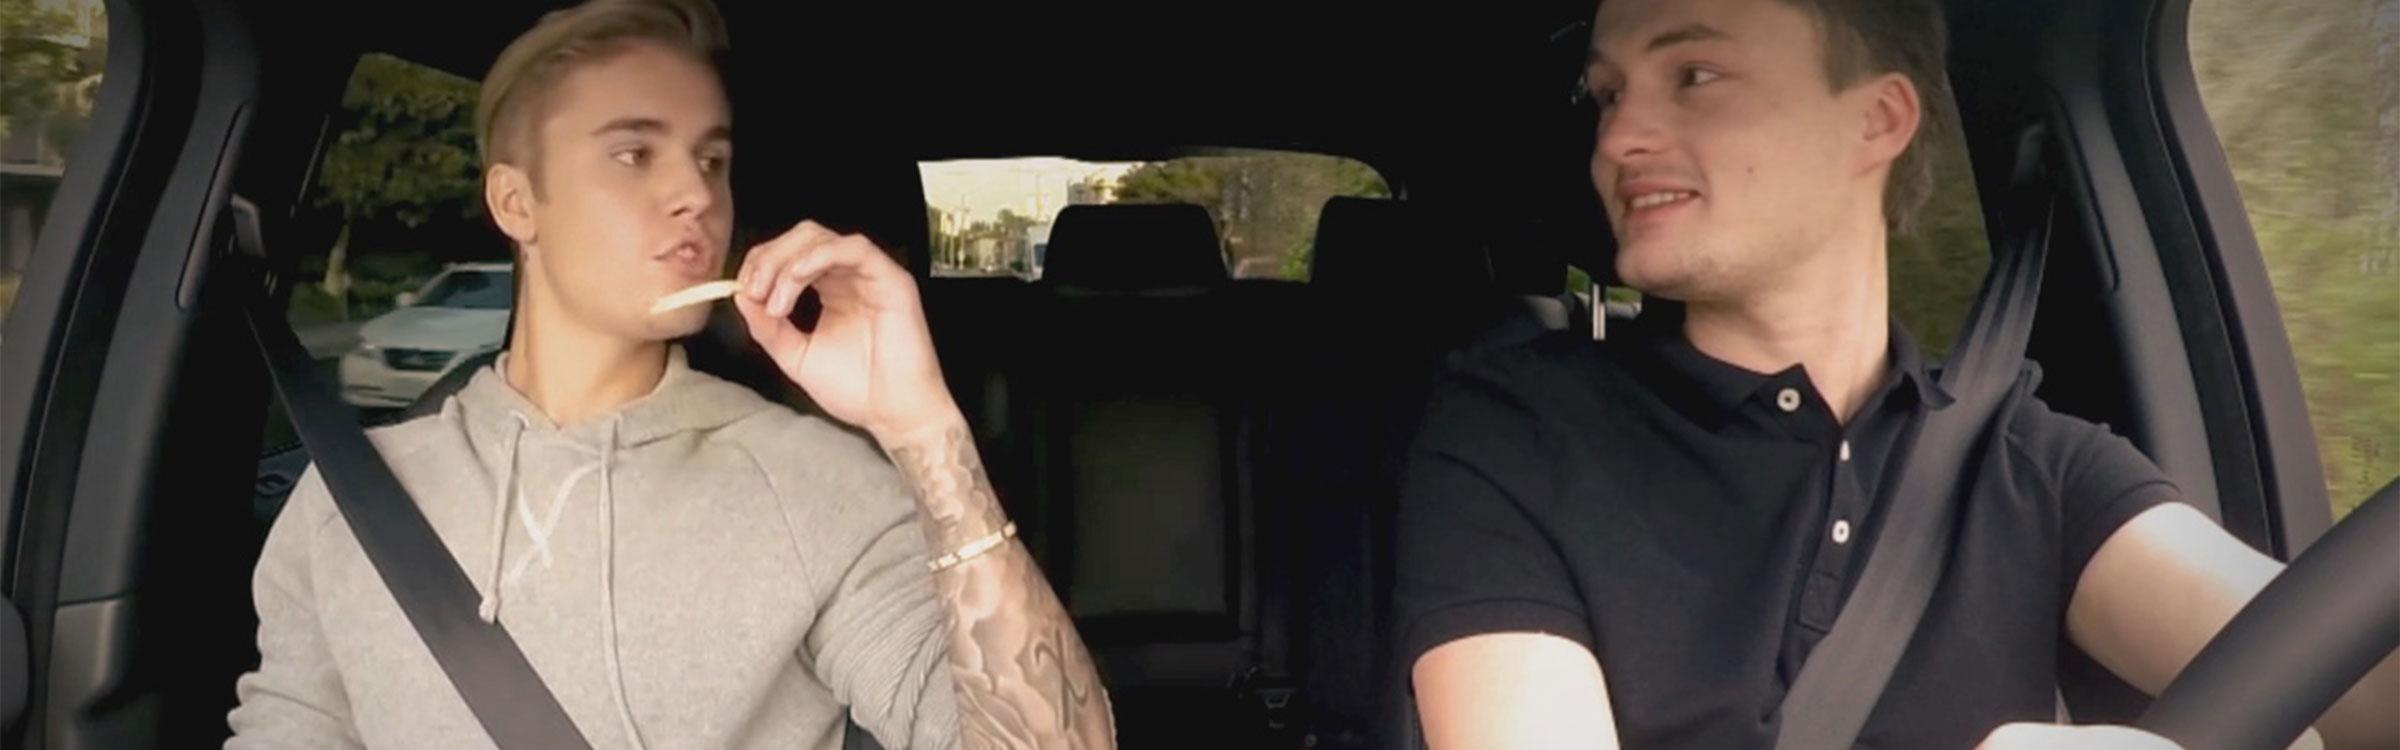 Bieber maarten pagina